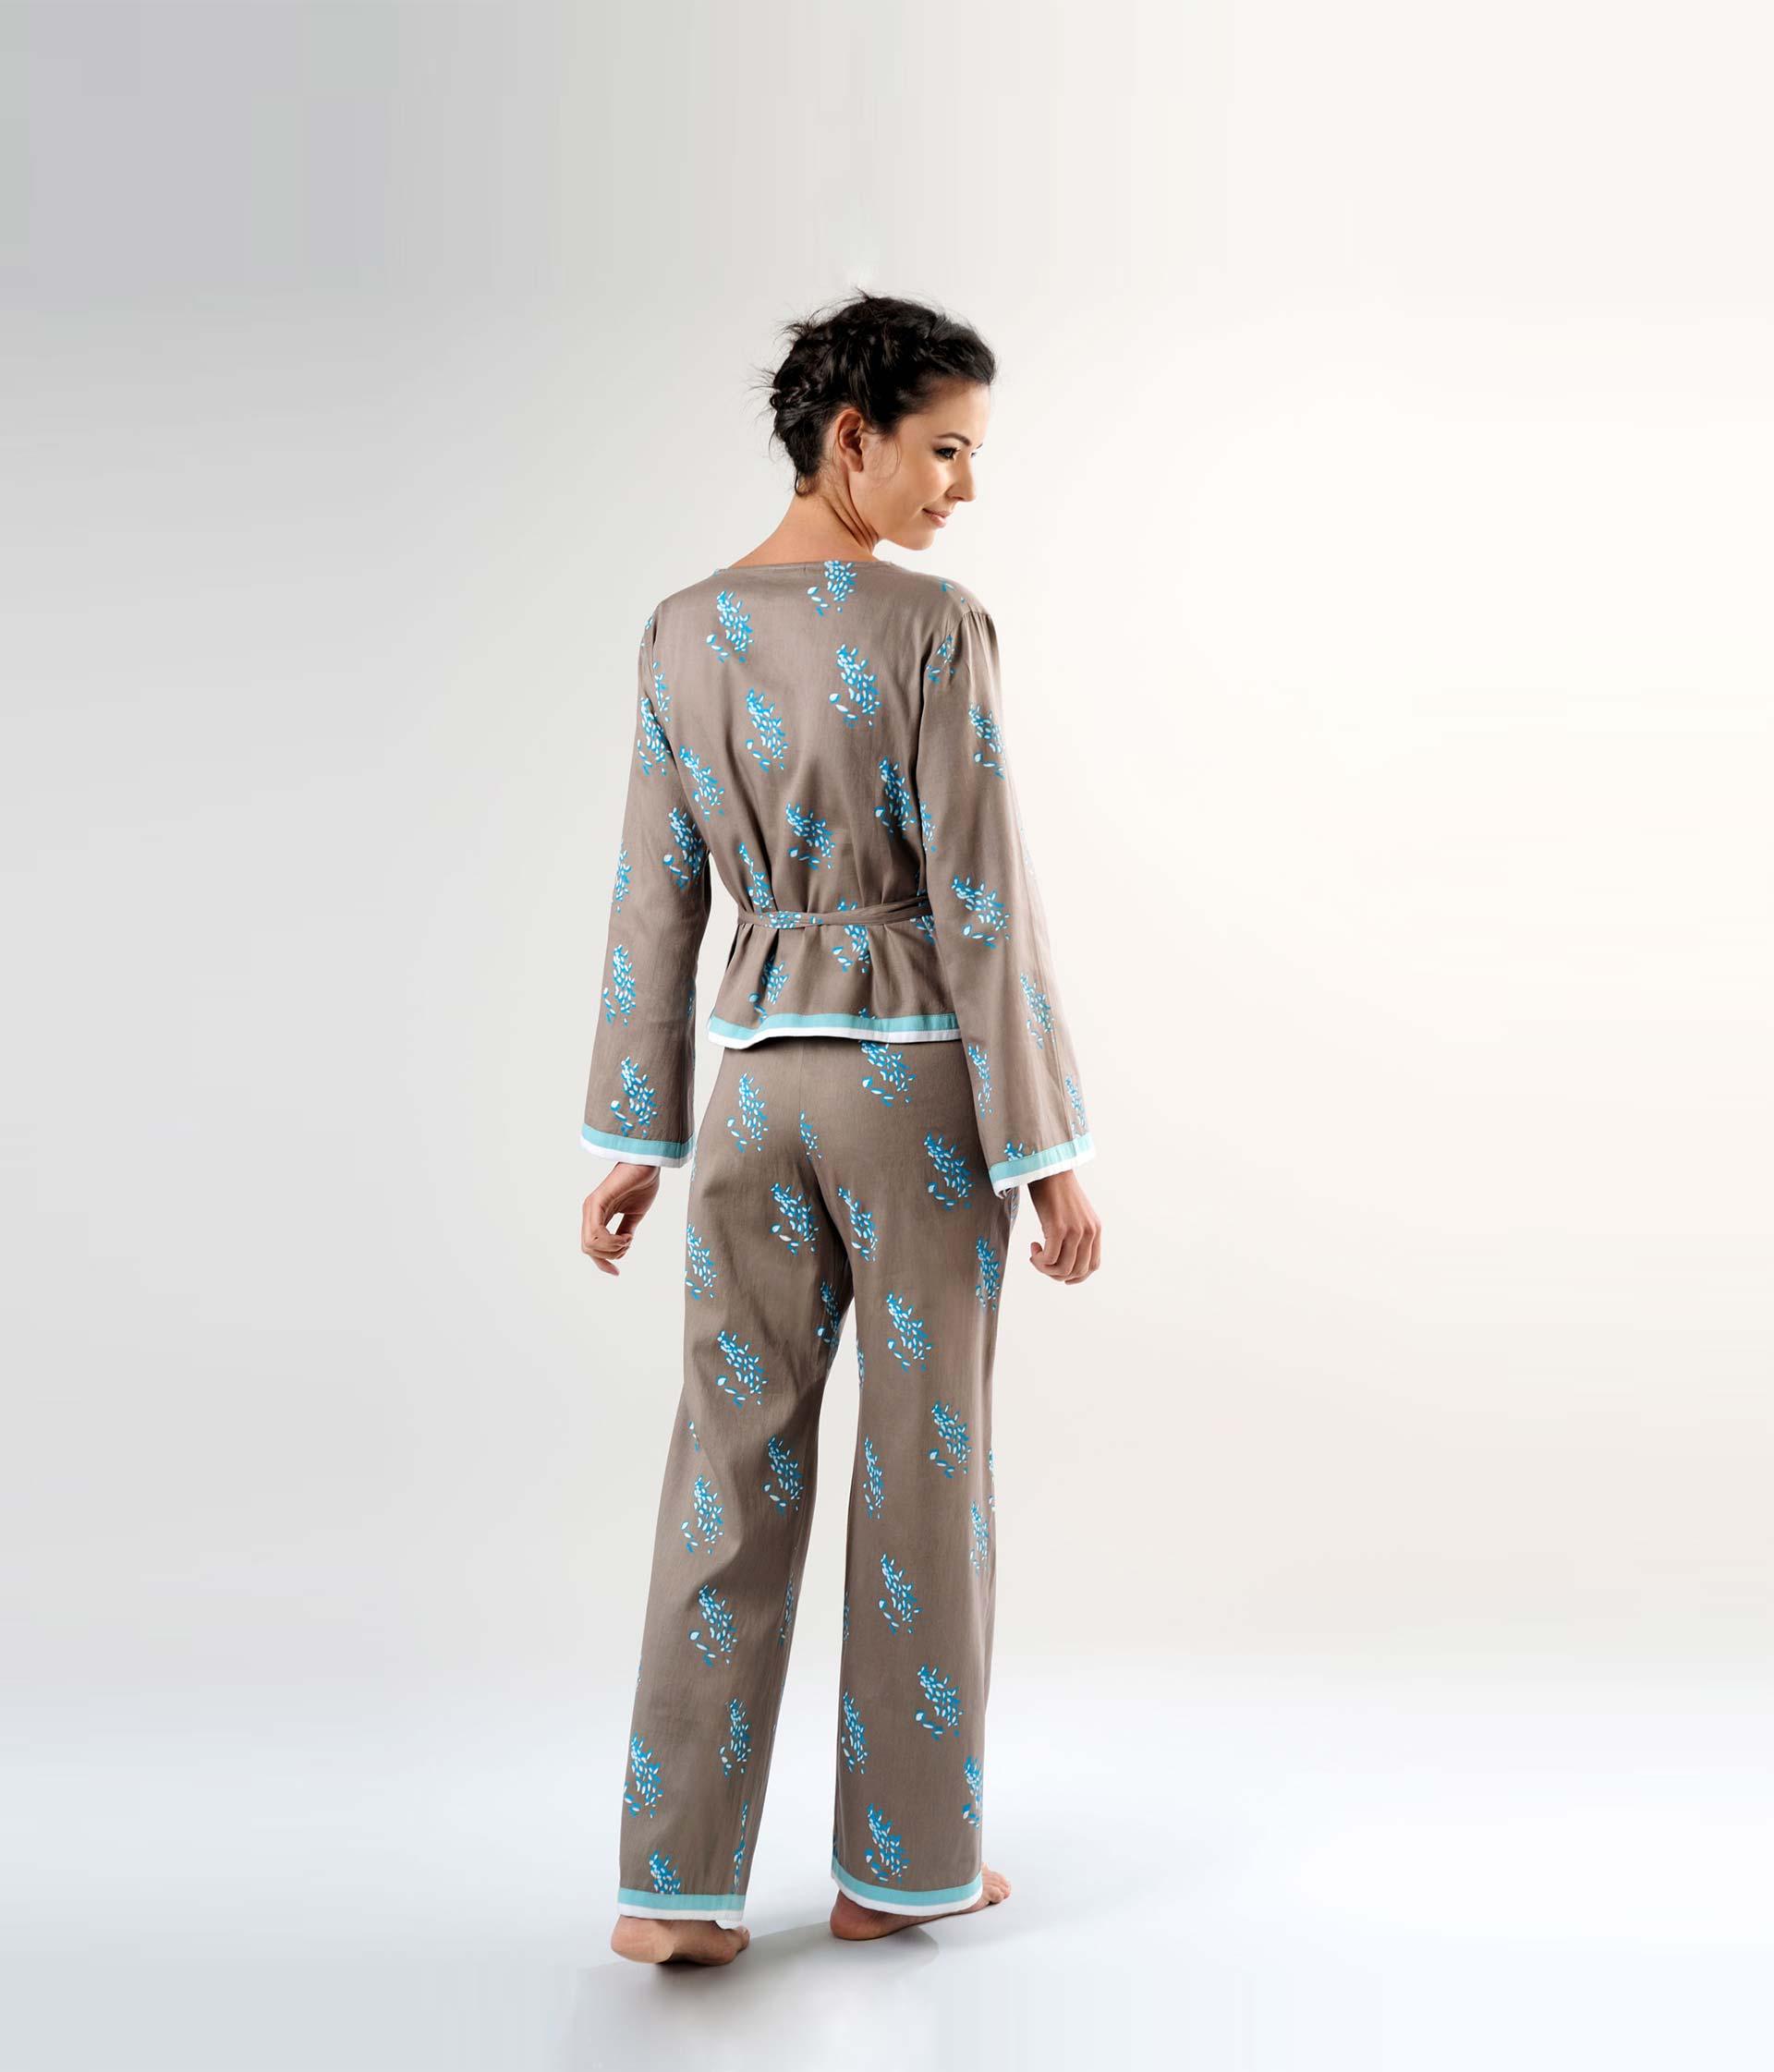 Sewing patterns ladies pyjamas Coba with a wrap-around top 9ade29234